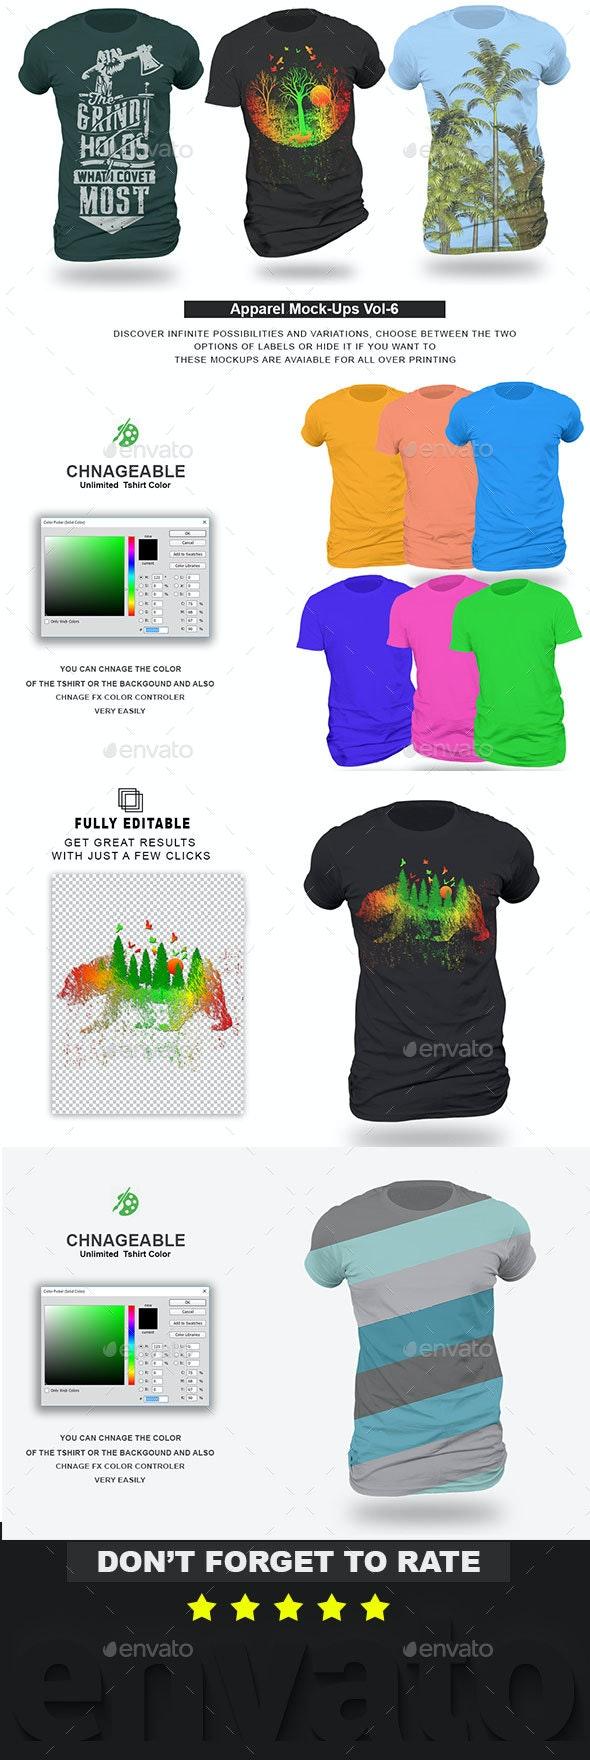 Apparel Mockup Vol 6 - T-shirts Apparel